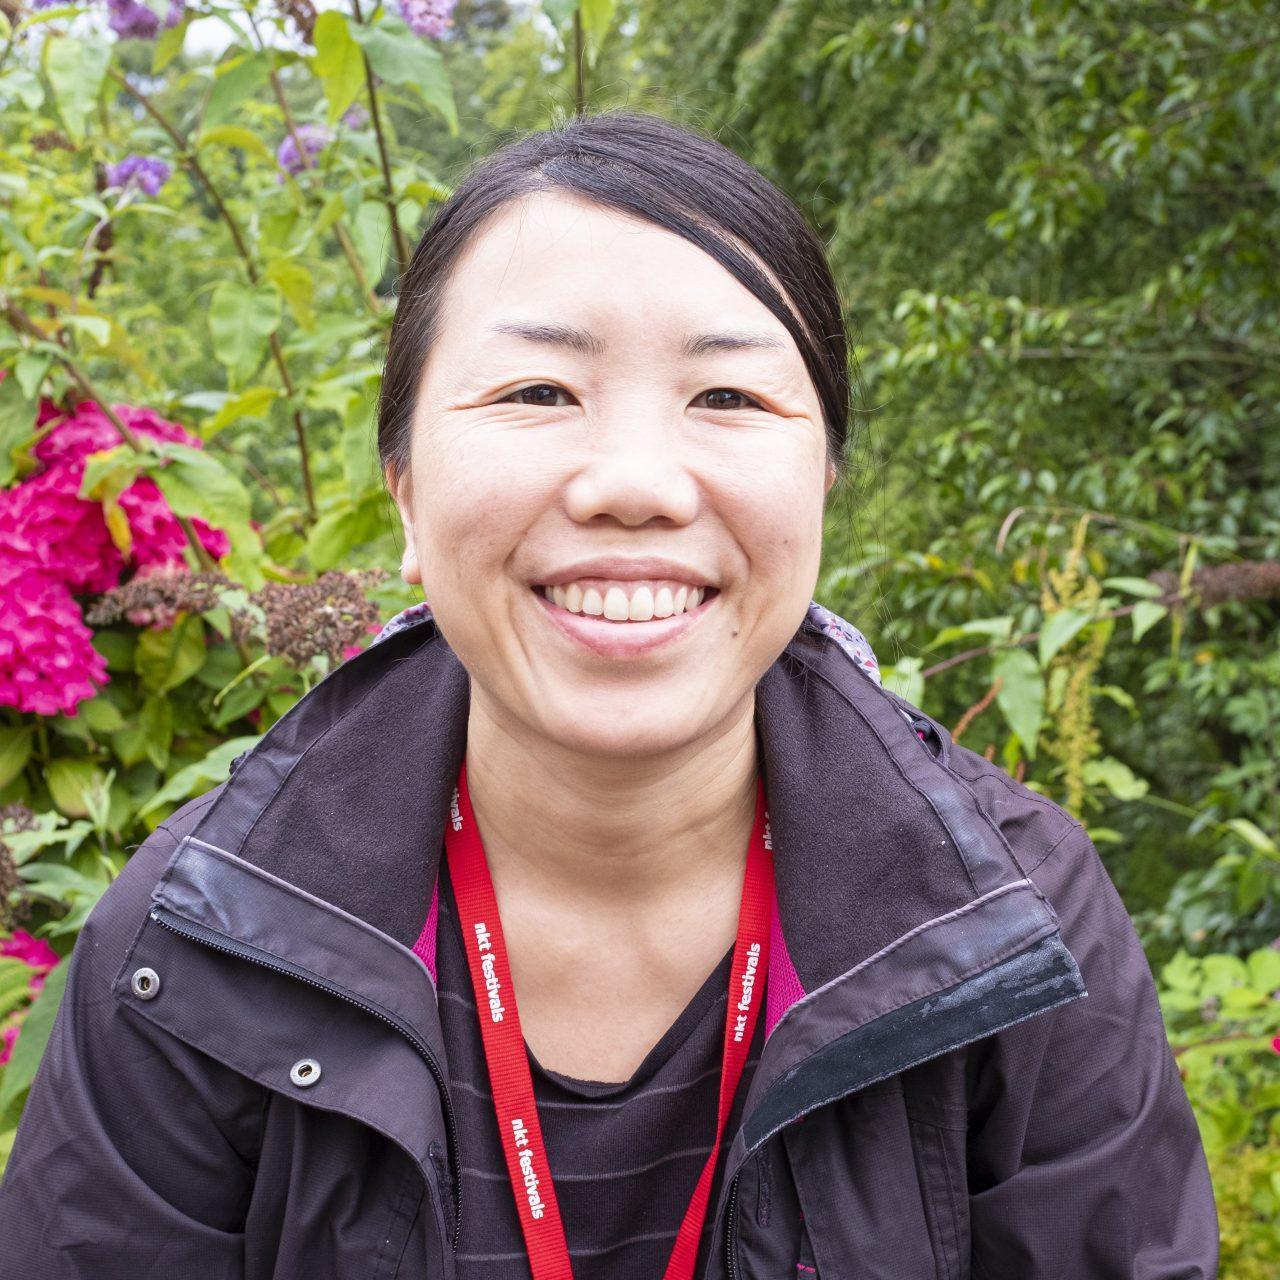 Rosemary-Lindfield-smiling-summer-festival